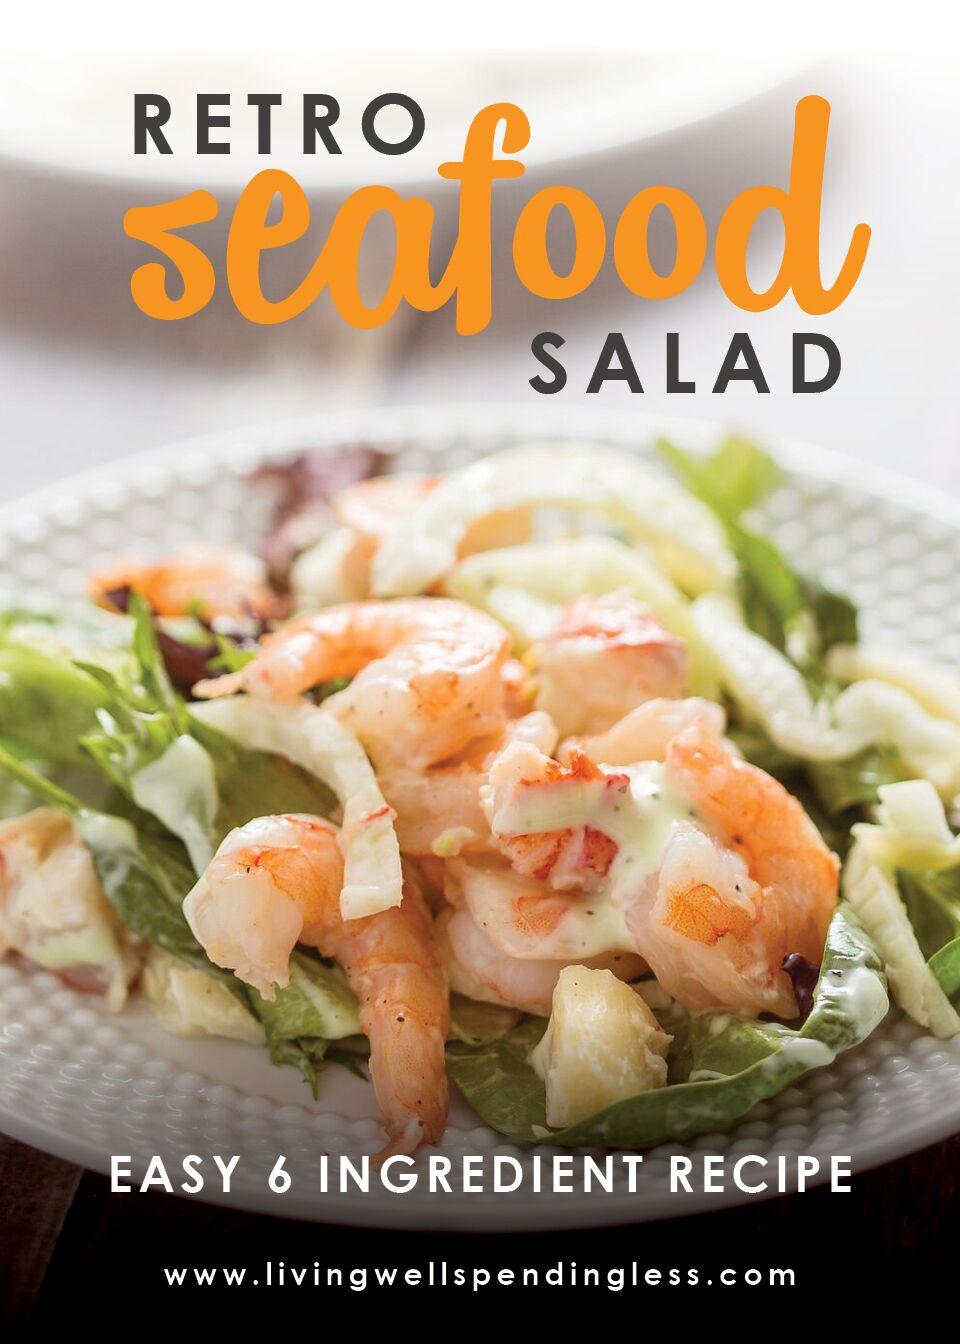 Retro Seafood Salad